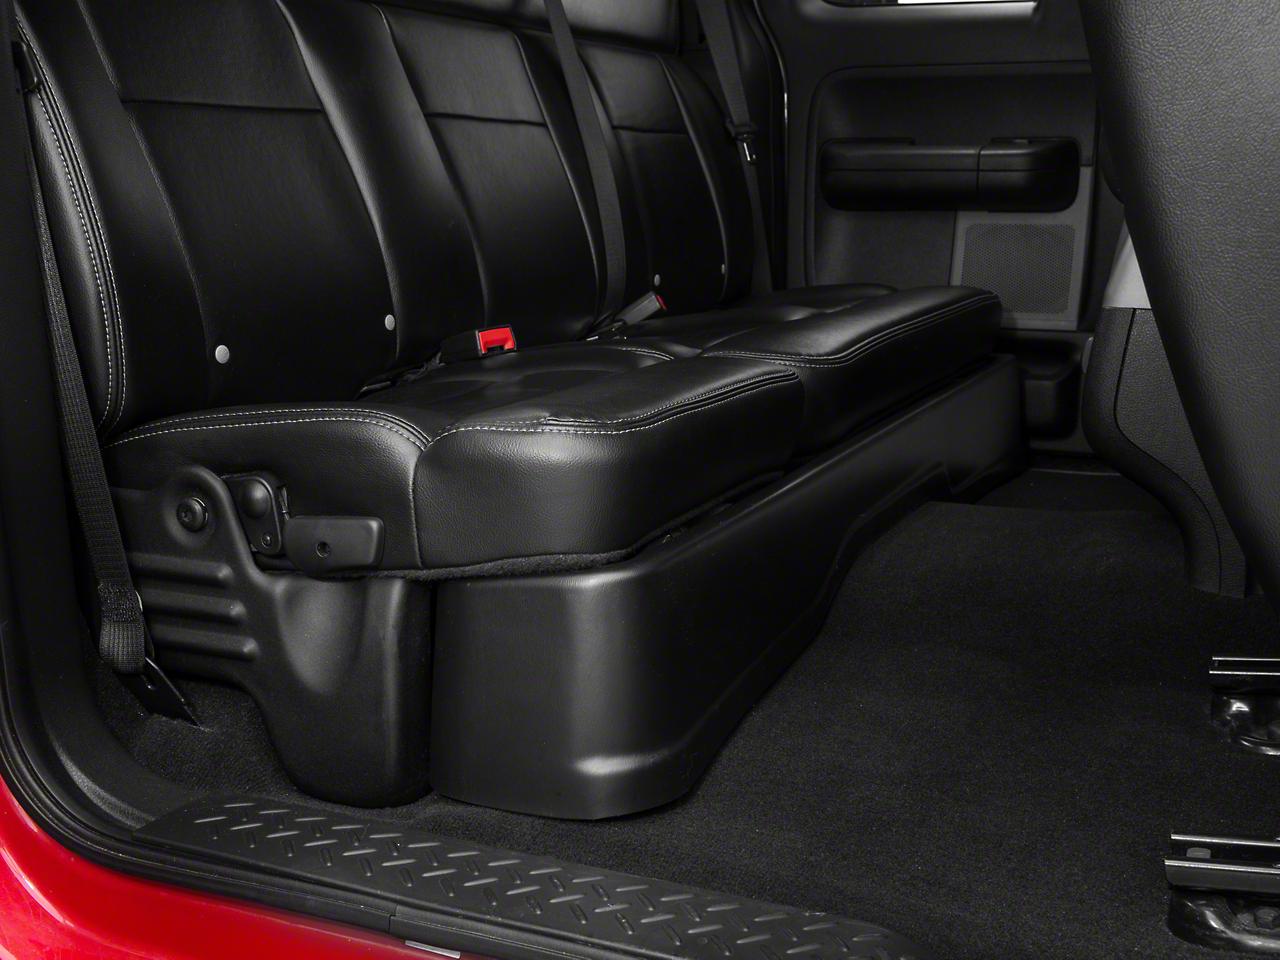 Husky Gearbox Under Seat Storage Box (04-08 F-150 SuperCab, SuperCrew)